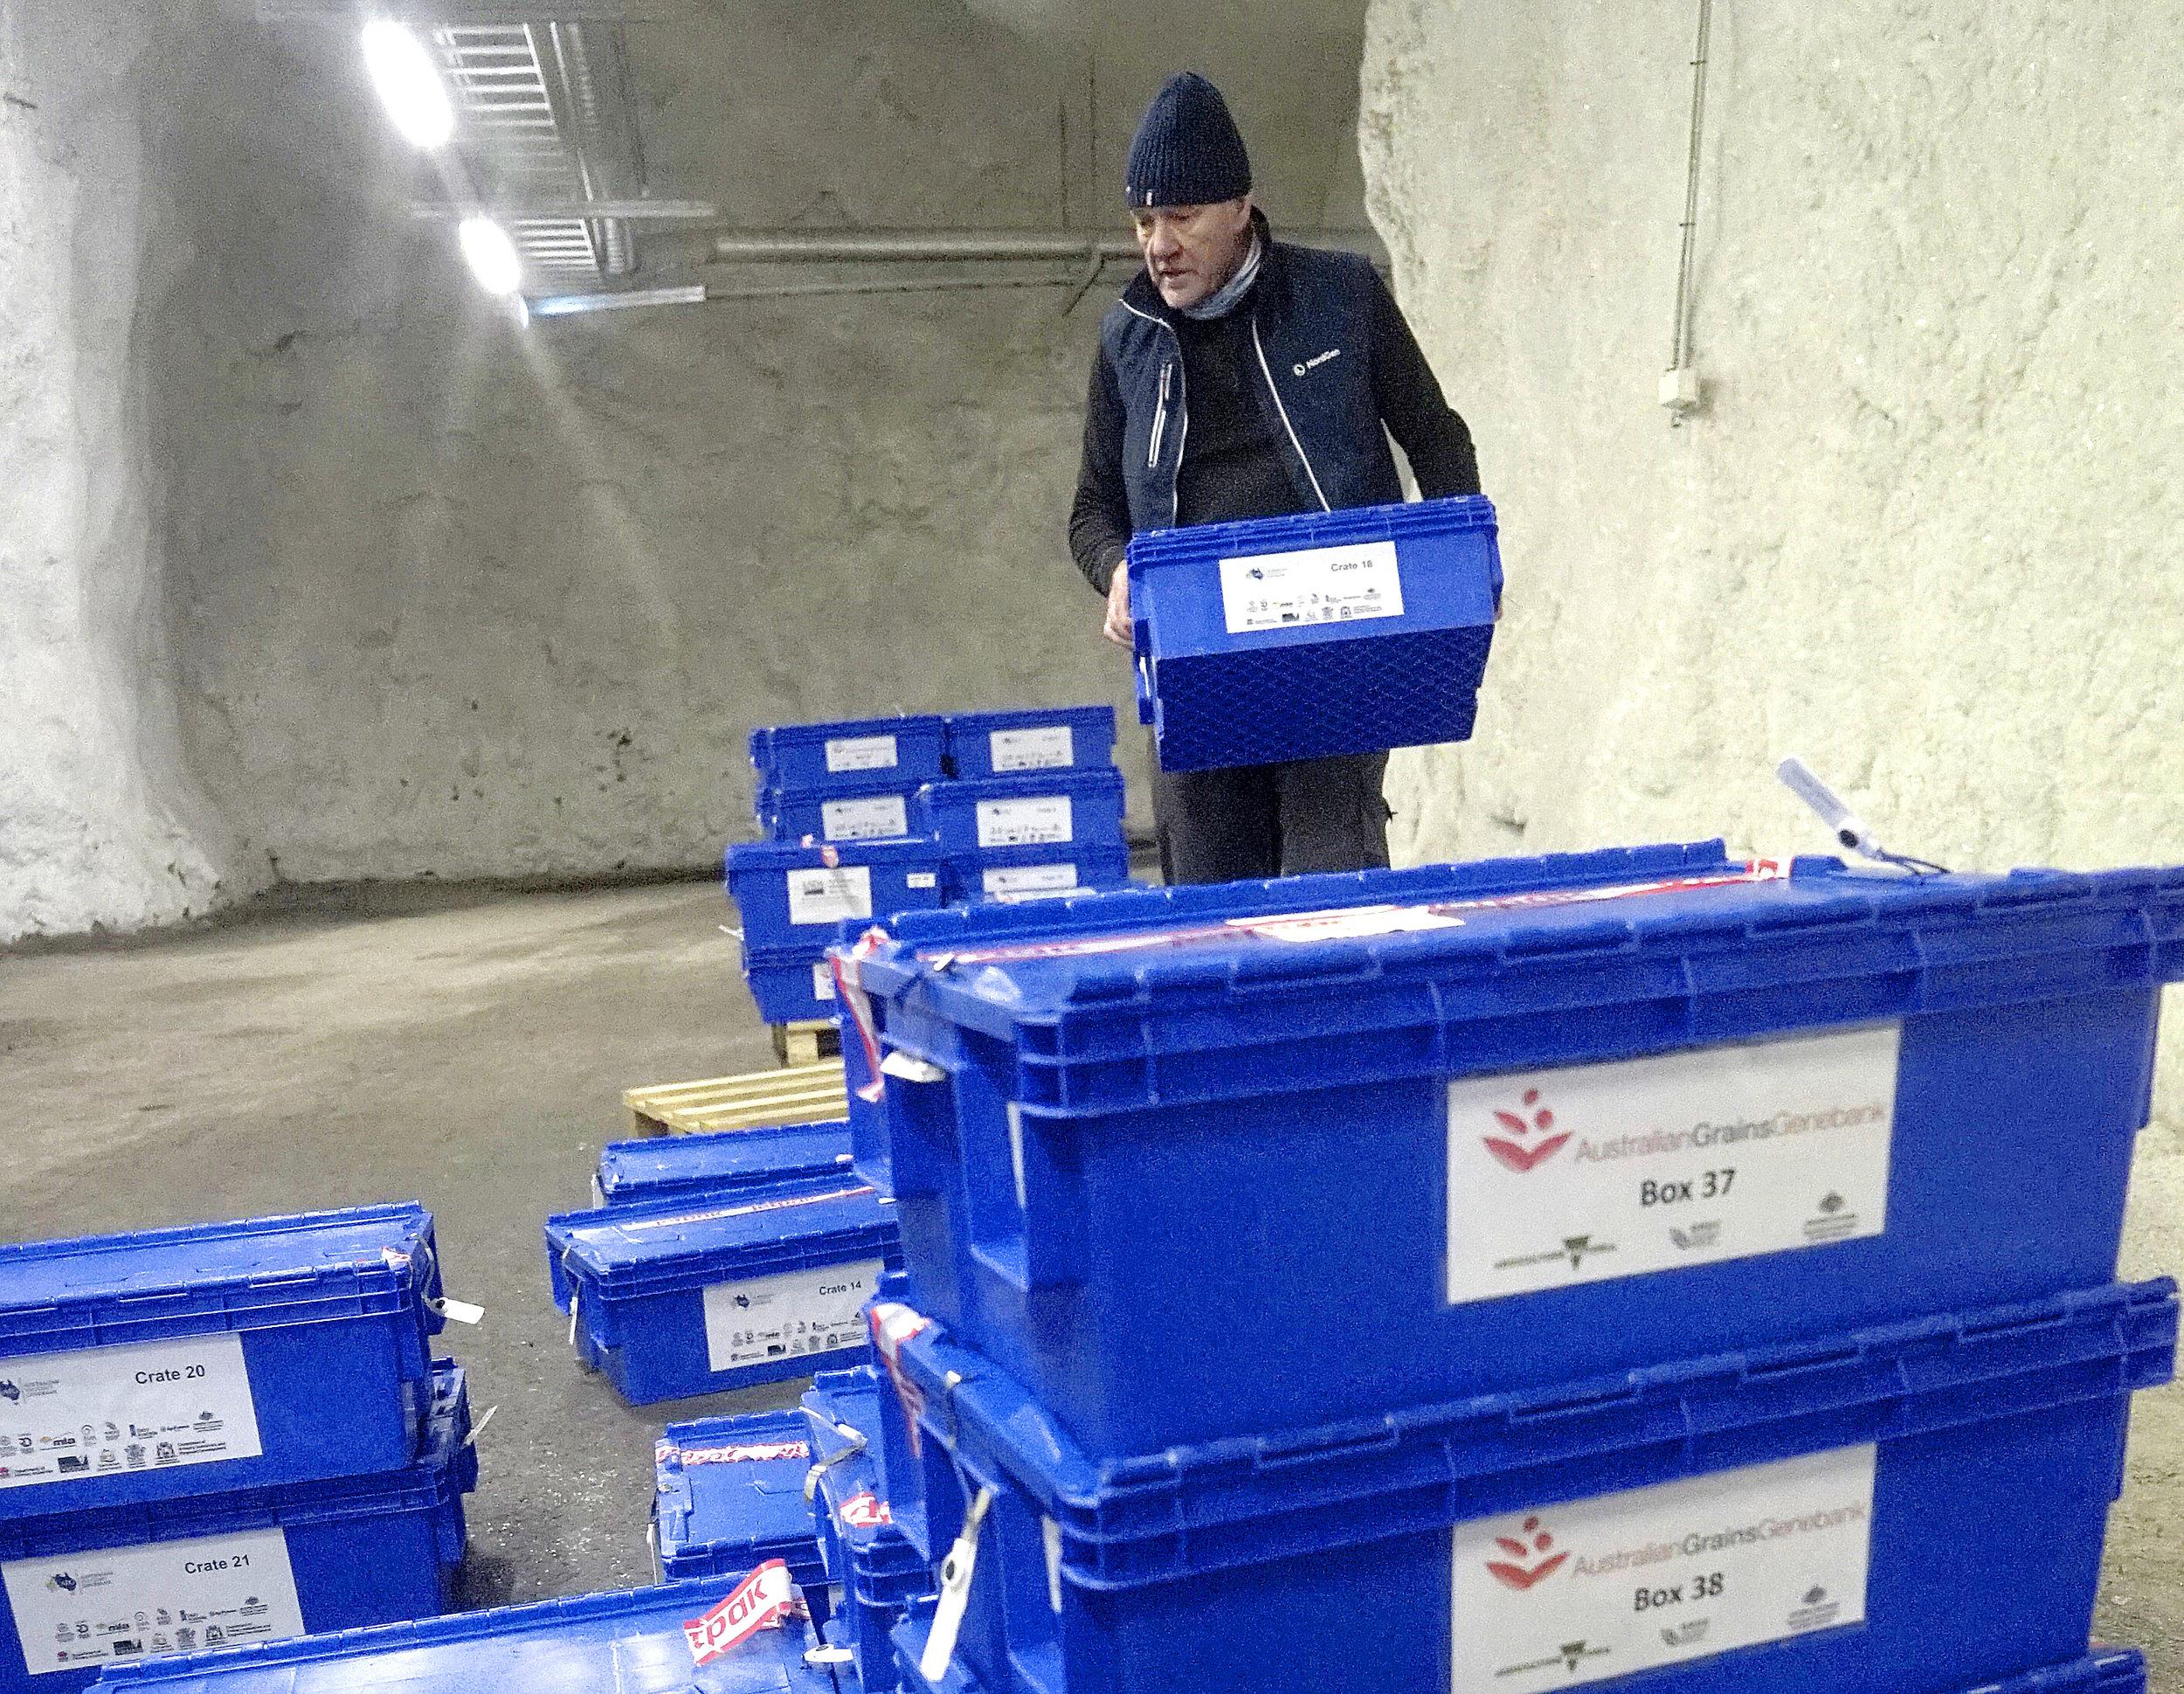 Åsmund Asdal helps transport seeds for storage in the Svalbard Global Seed Vault. (Photo: Nordgen)